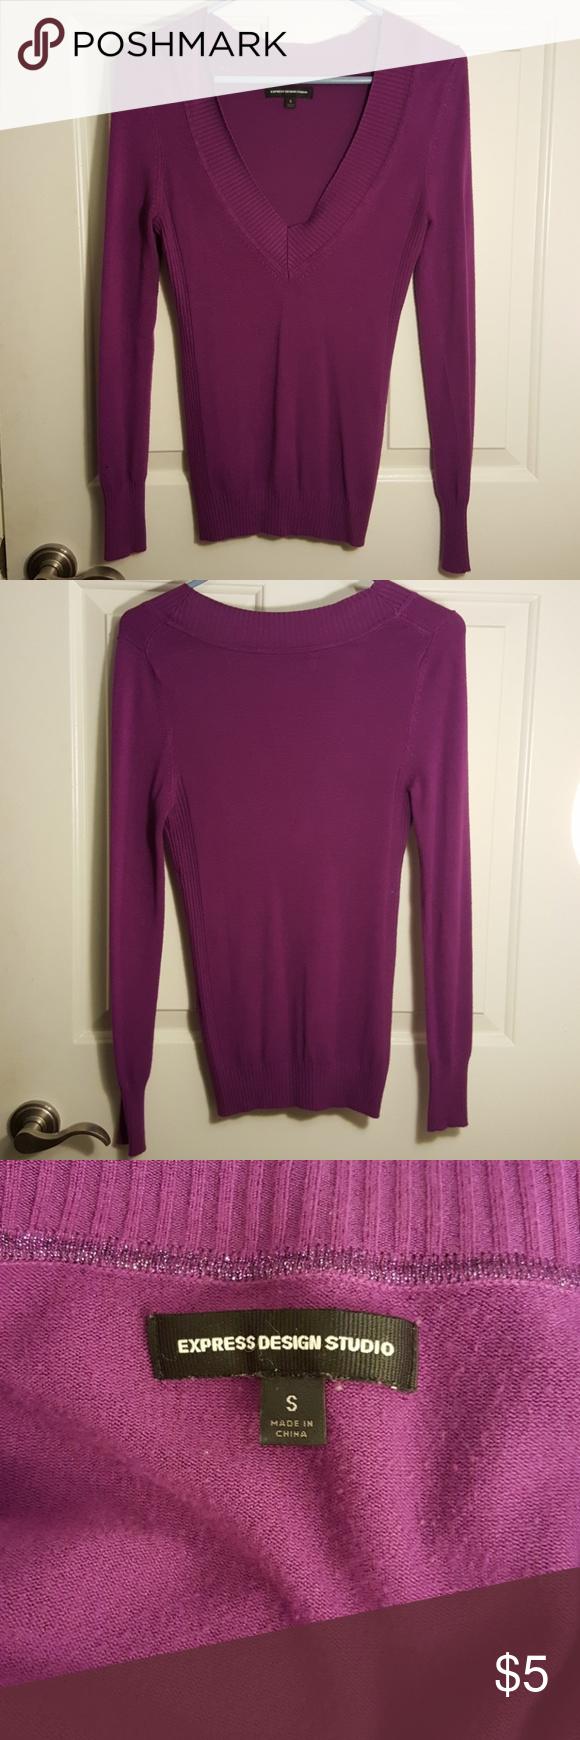 Express Design Studio Purple Sweater | Studios, Purple and Keys